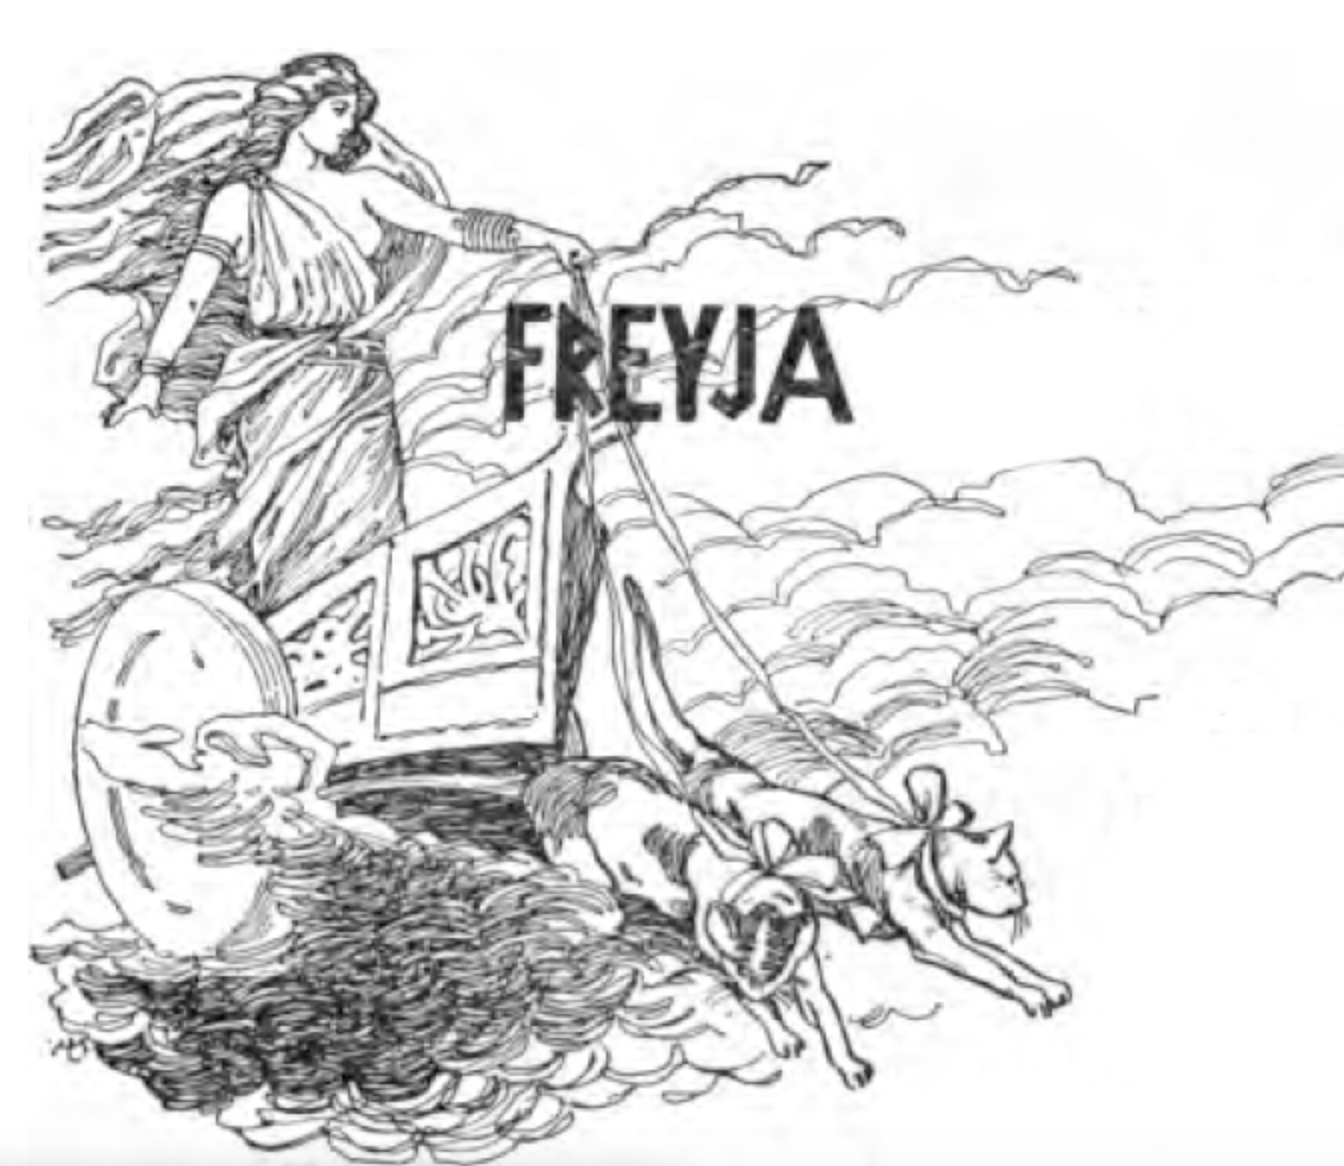 Freyja, The Bold!